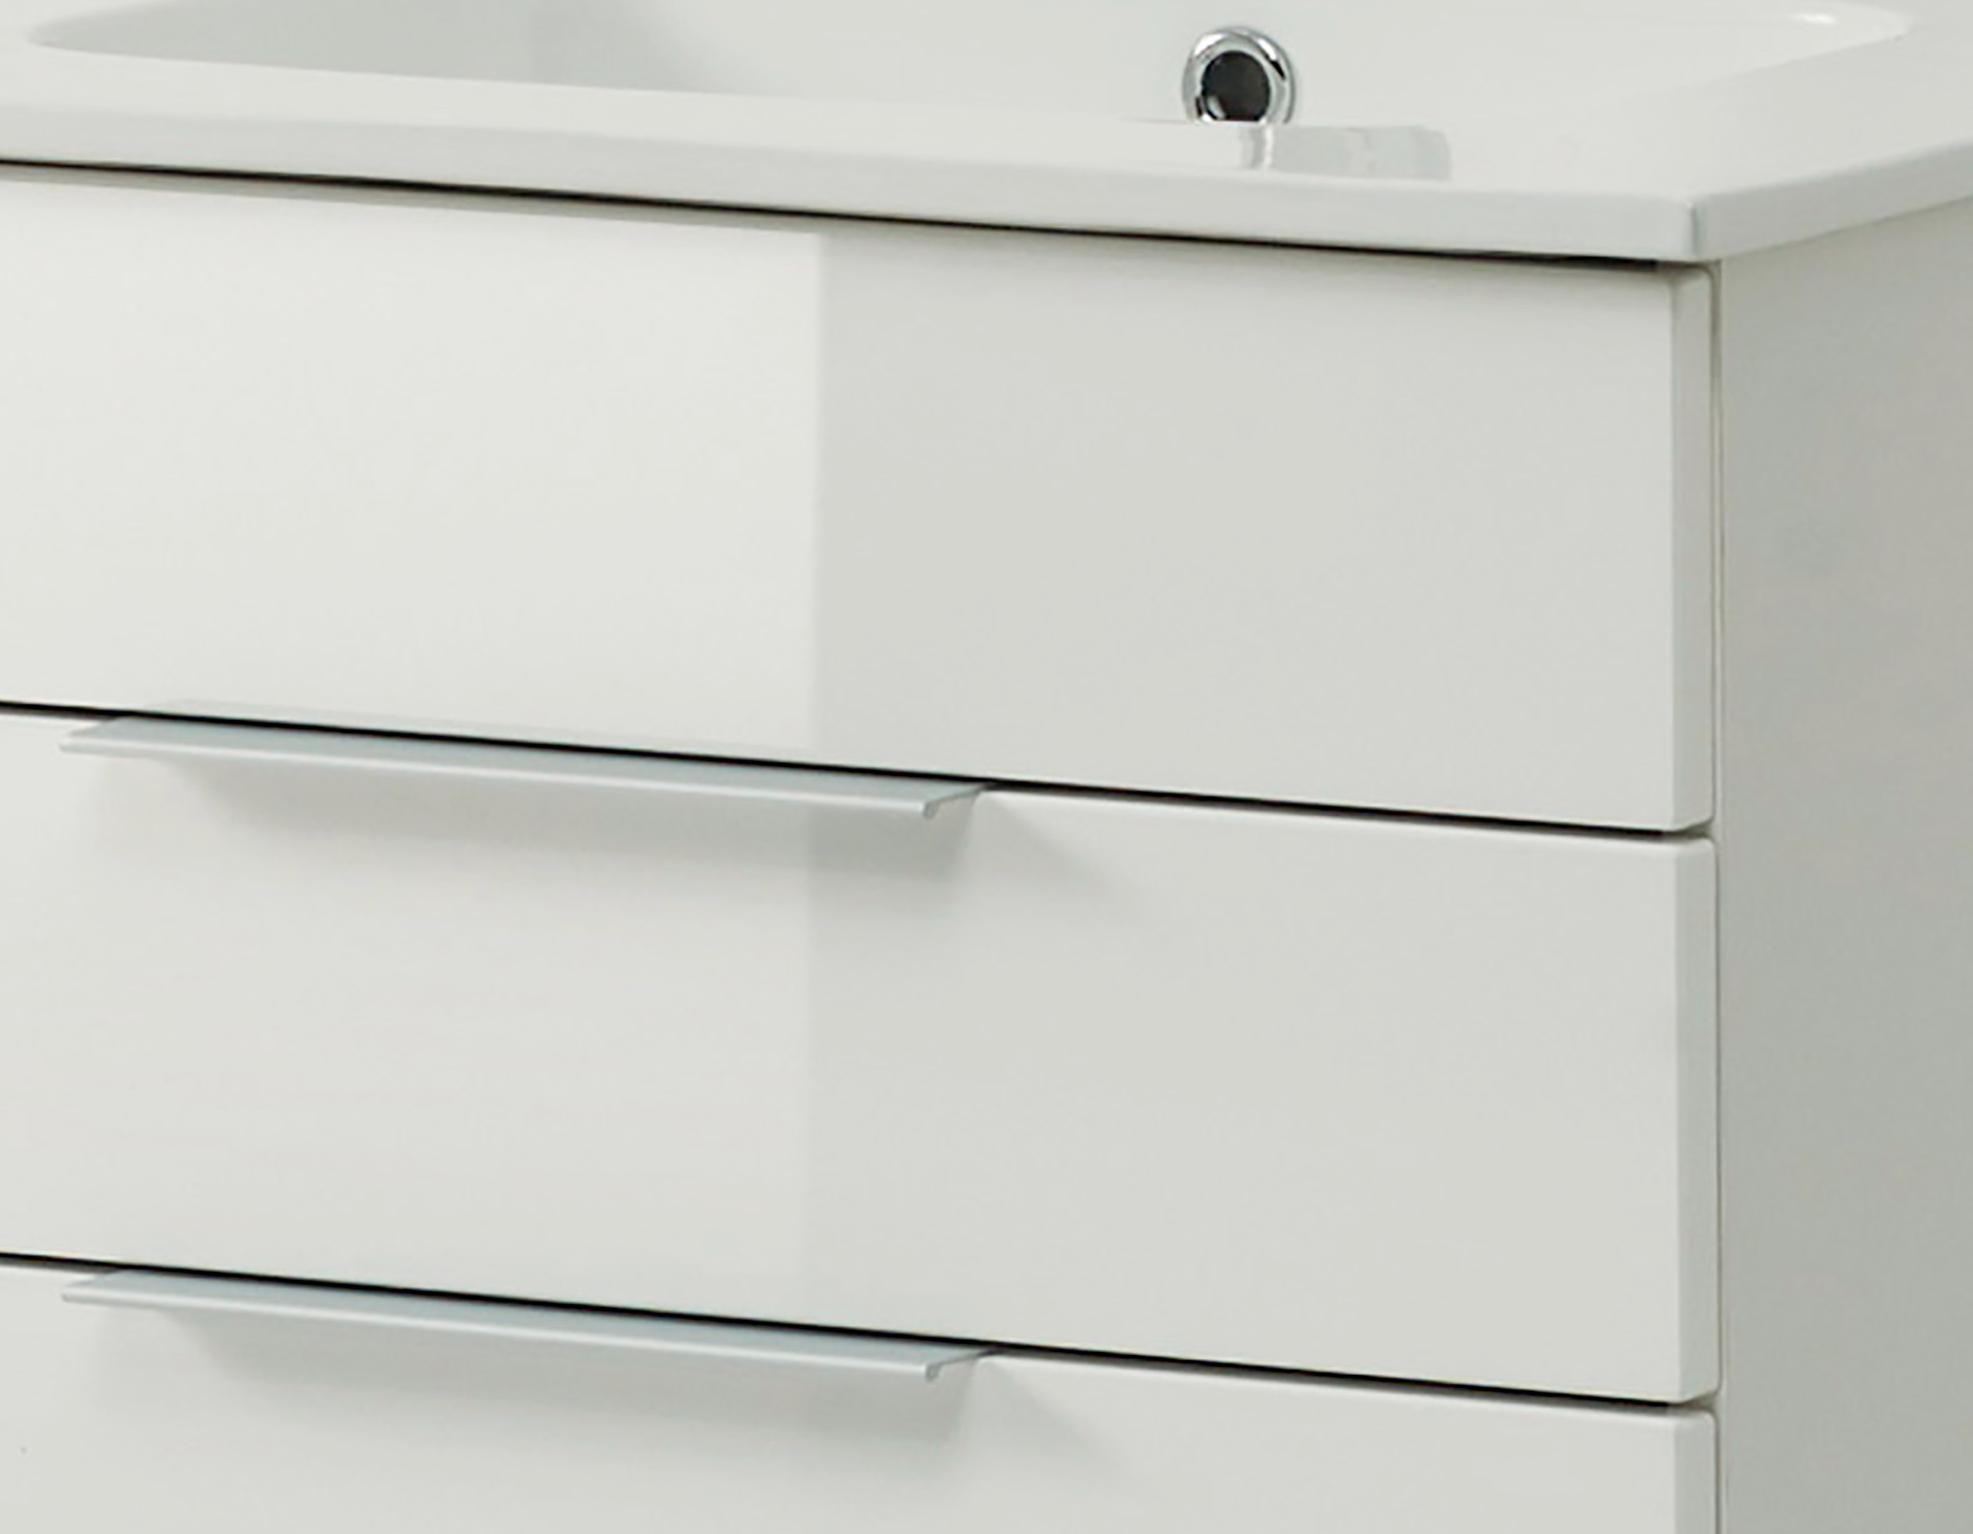 badm bel set ravello mit keramikbecken 4 teilig 60 cm breit wei bad badm belsets. Black Bedroom Furniture Sets. Home Design Ideas